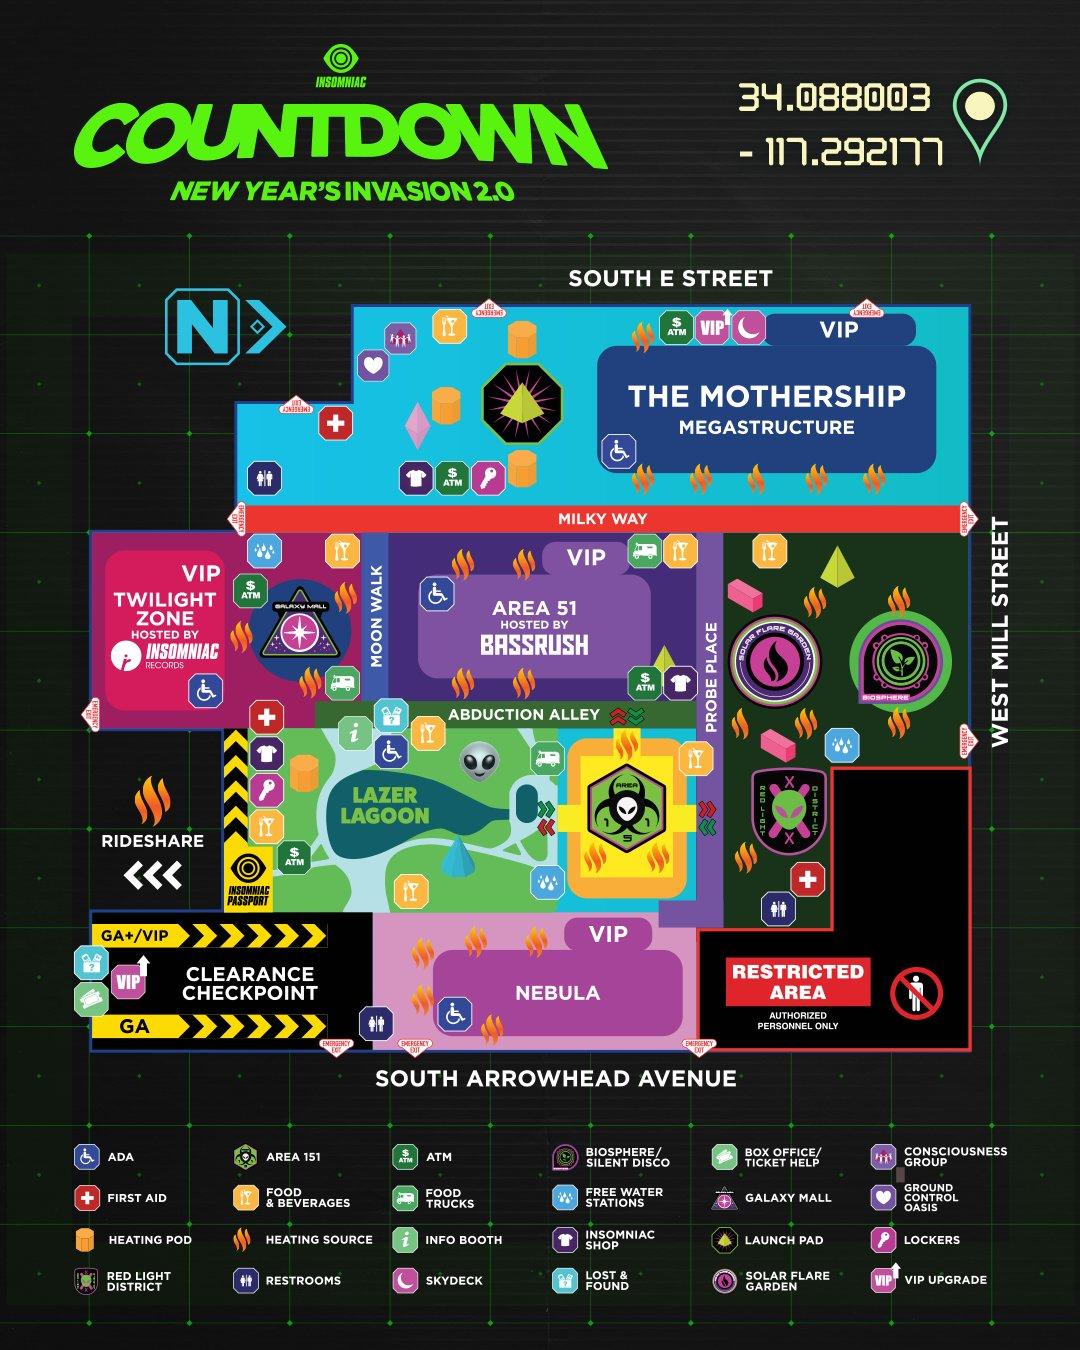 2020 Countdown NYE venue map